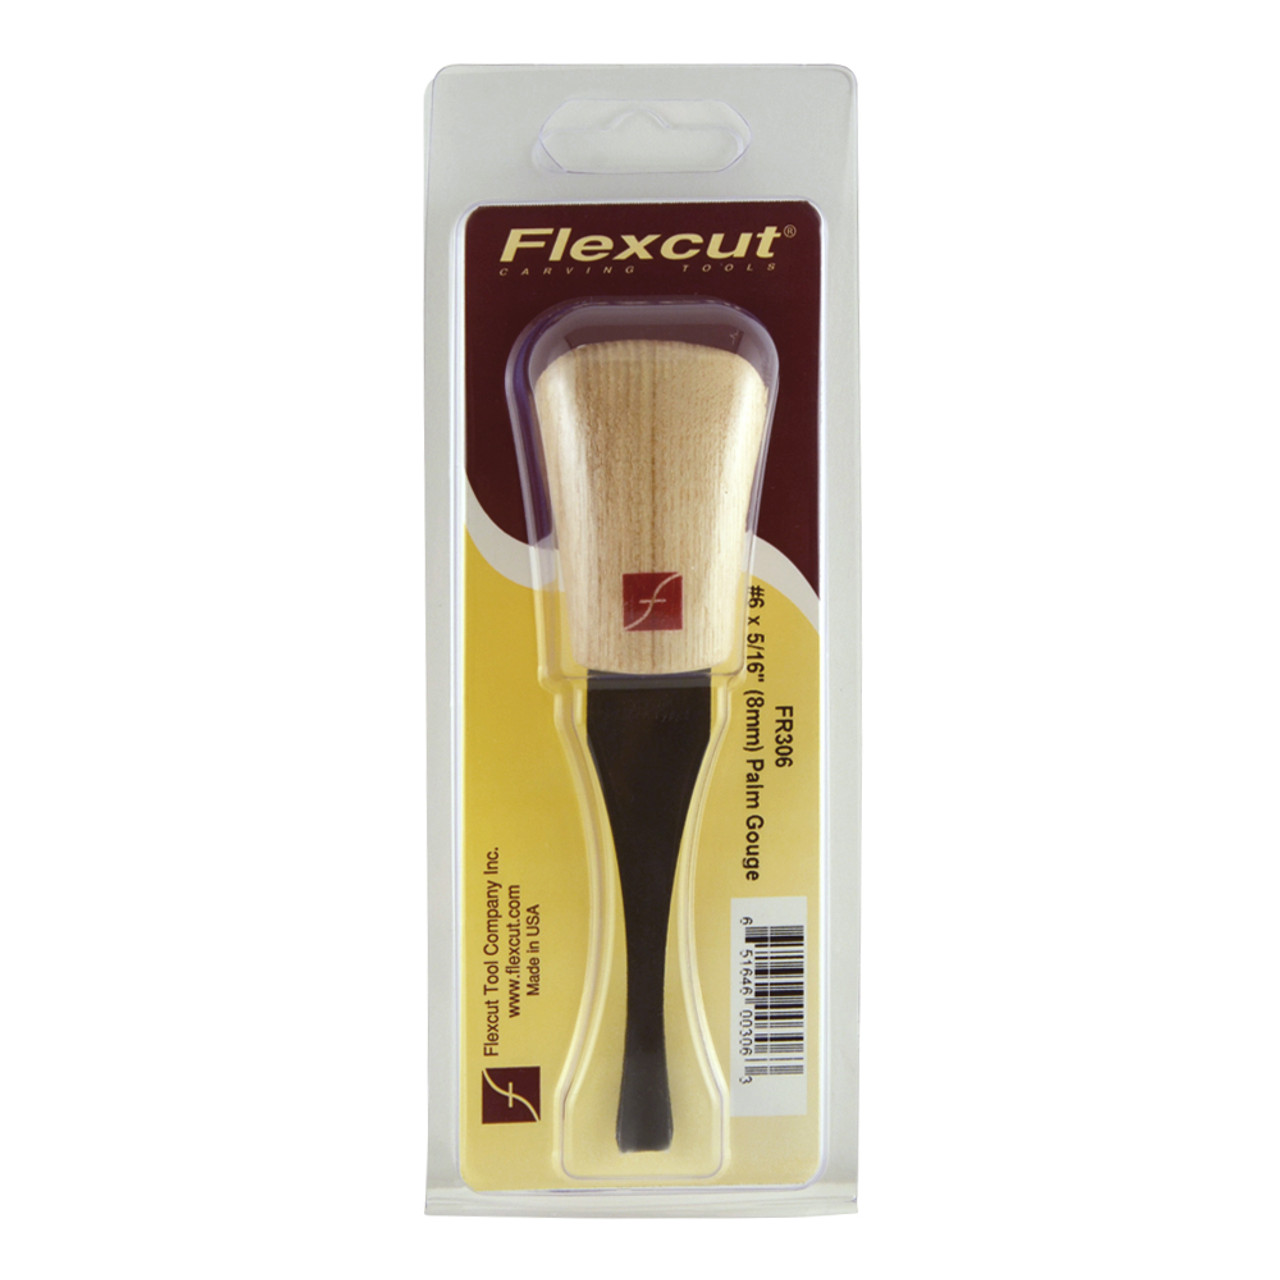 "Flexcut FR306 Palm Carving Gouge #6 x 5/16"" shown in it's original package."